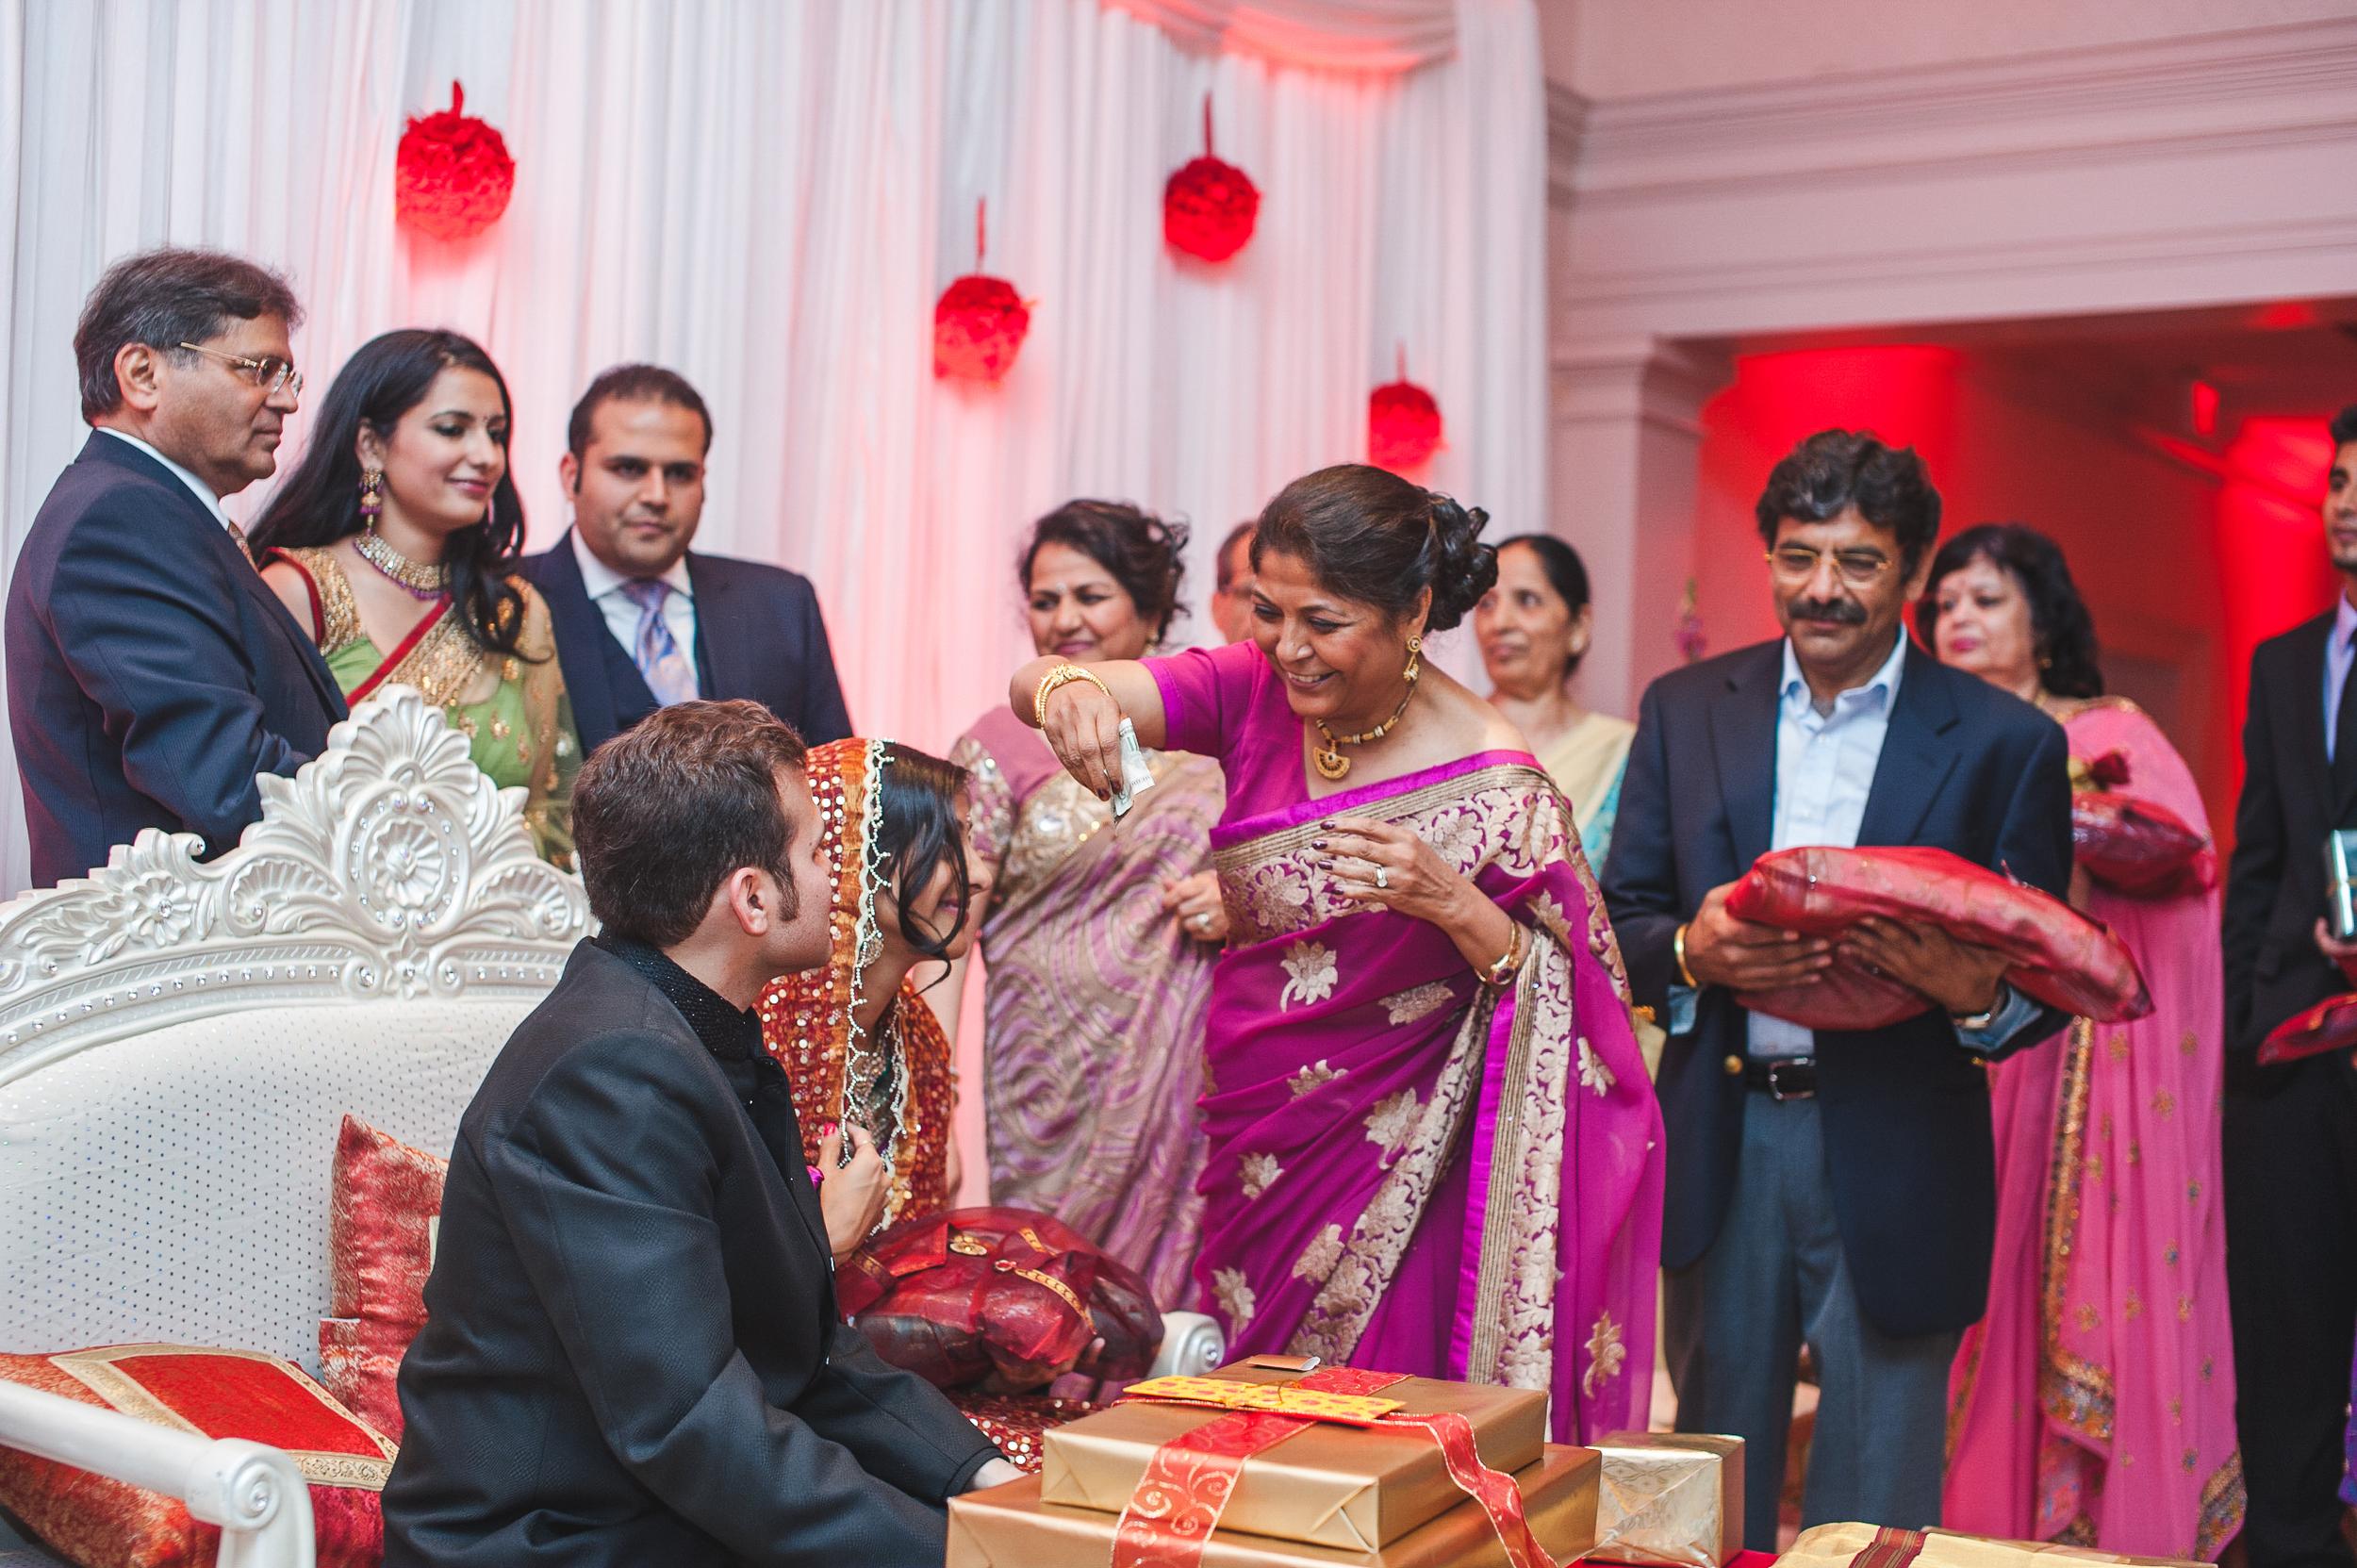 Indian wedding photographer washington dc Mantas Kubilinskas-4.jpg